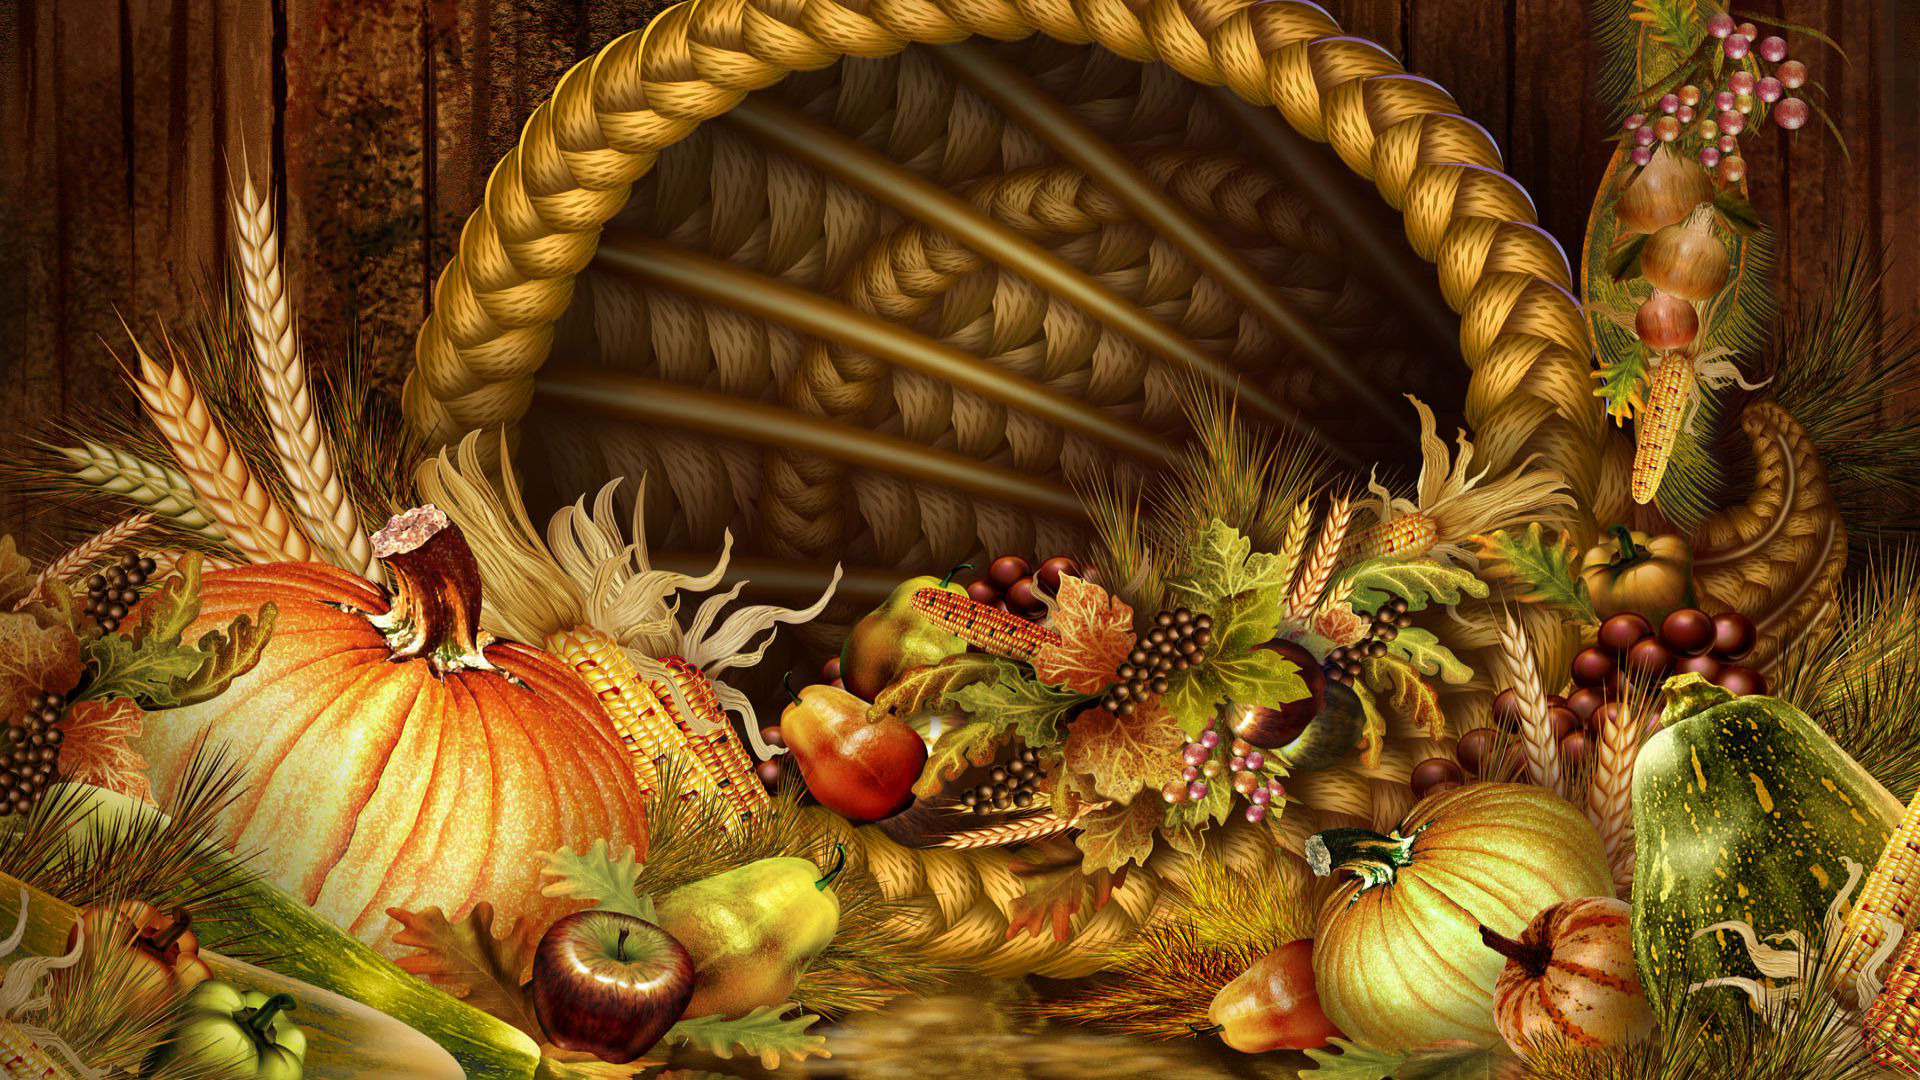 Thanksgiving Wallpapers for Desktop 1600x900 - WallpaperSafari